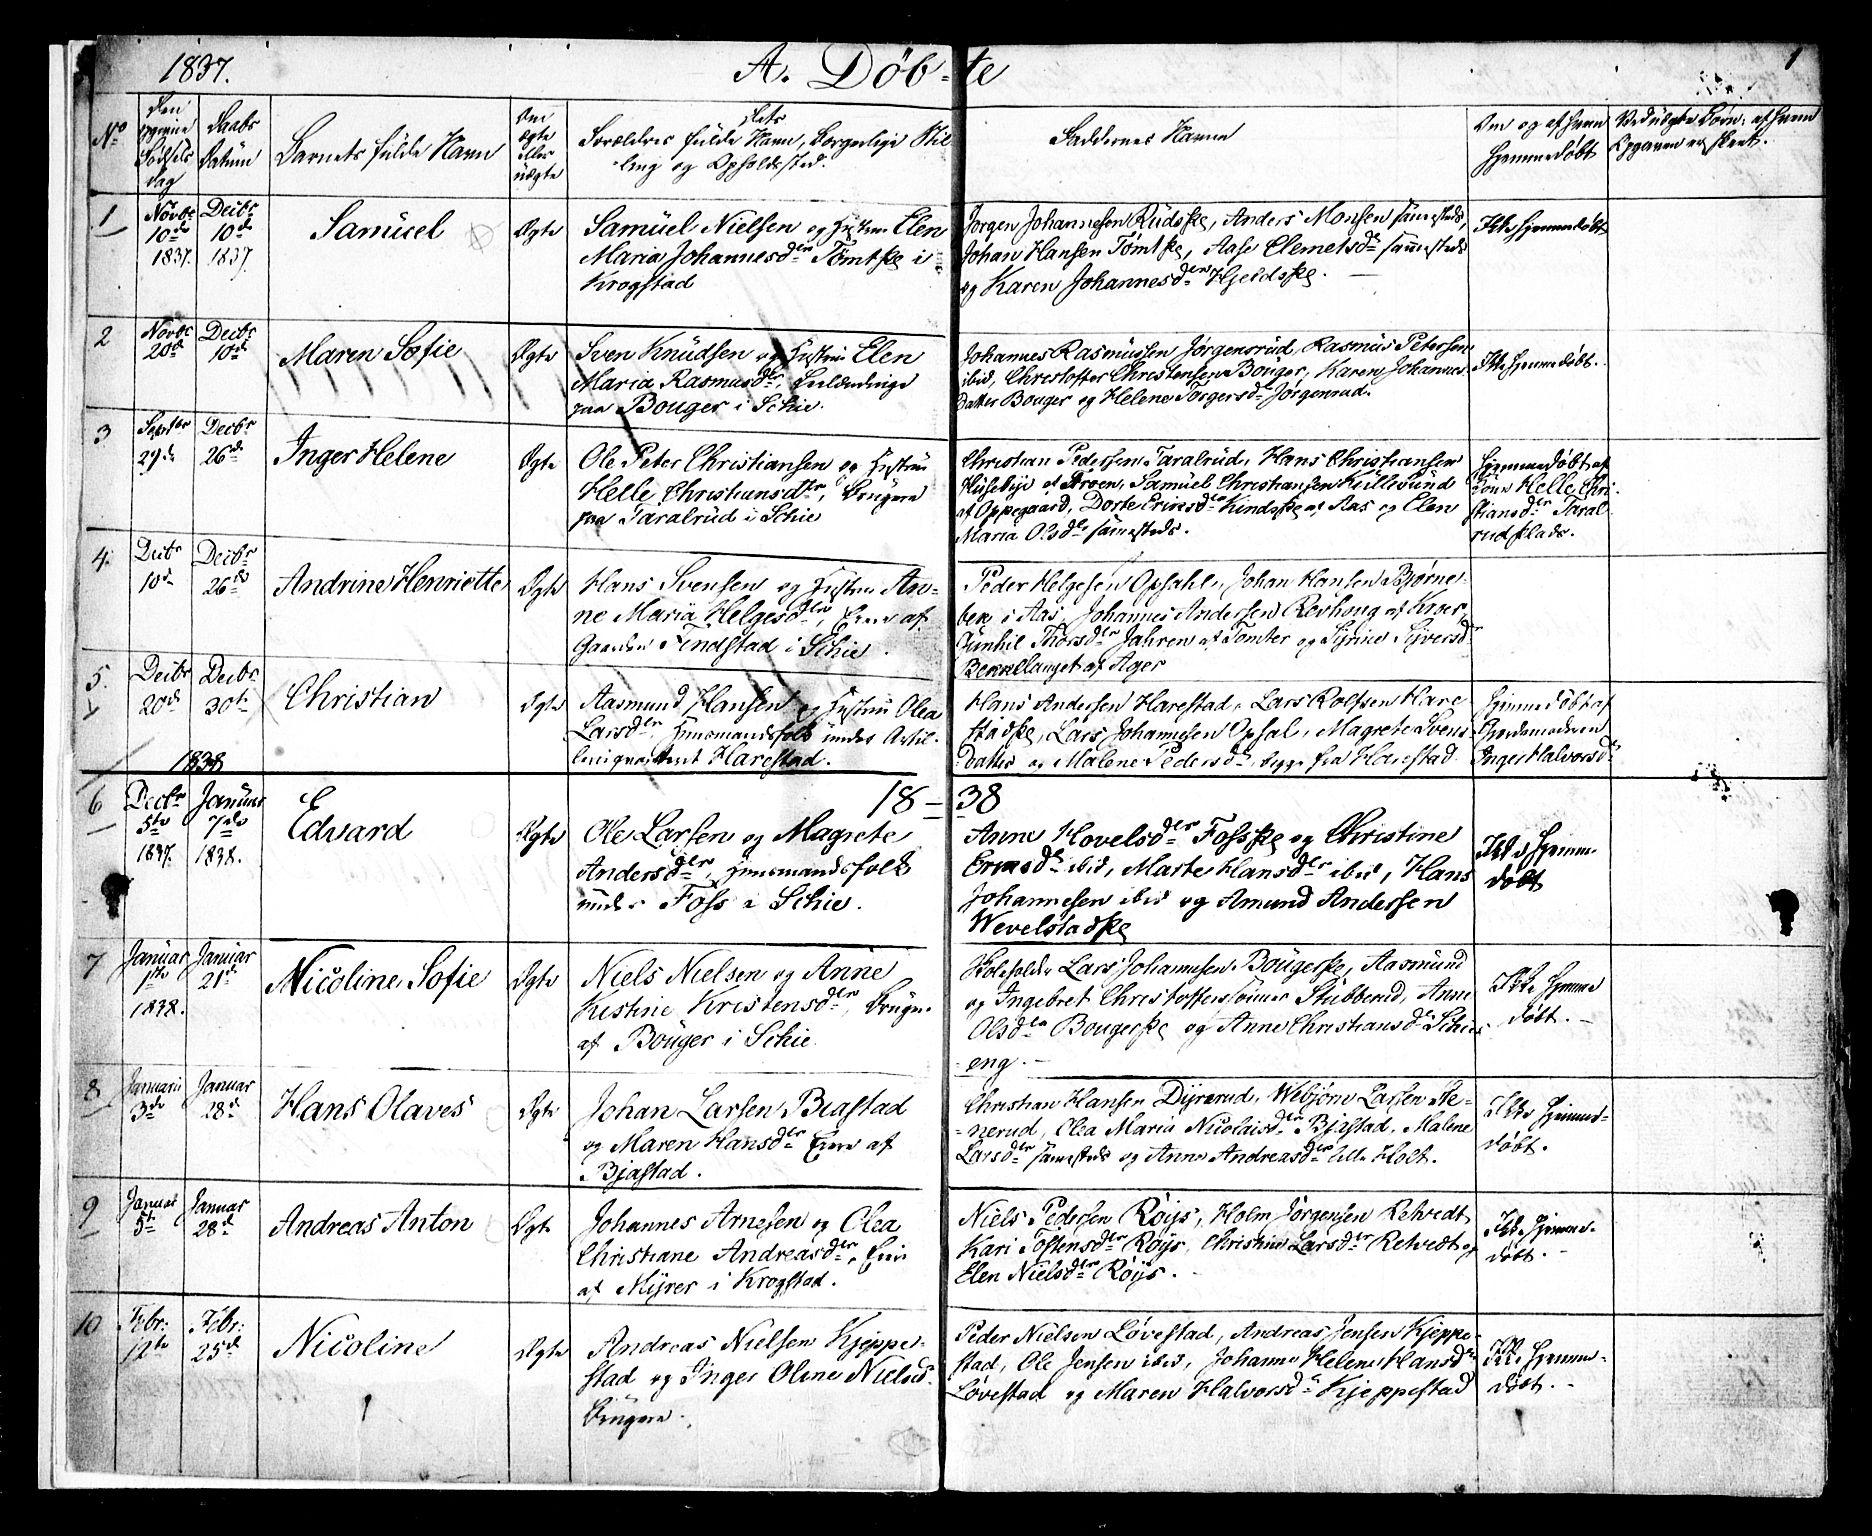 SAO, Kråkstad prestekontor Kirkebøker, F/Fa/L0005: Ministerialbok nr. I 5, 1837-1847, s. 1